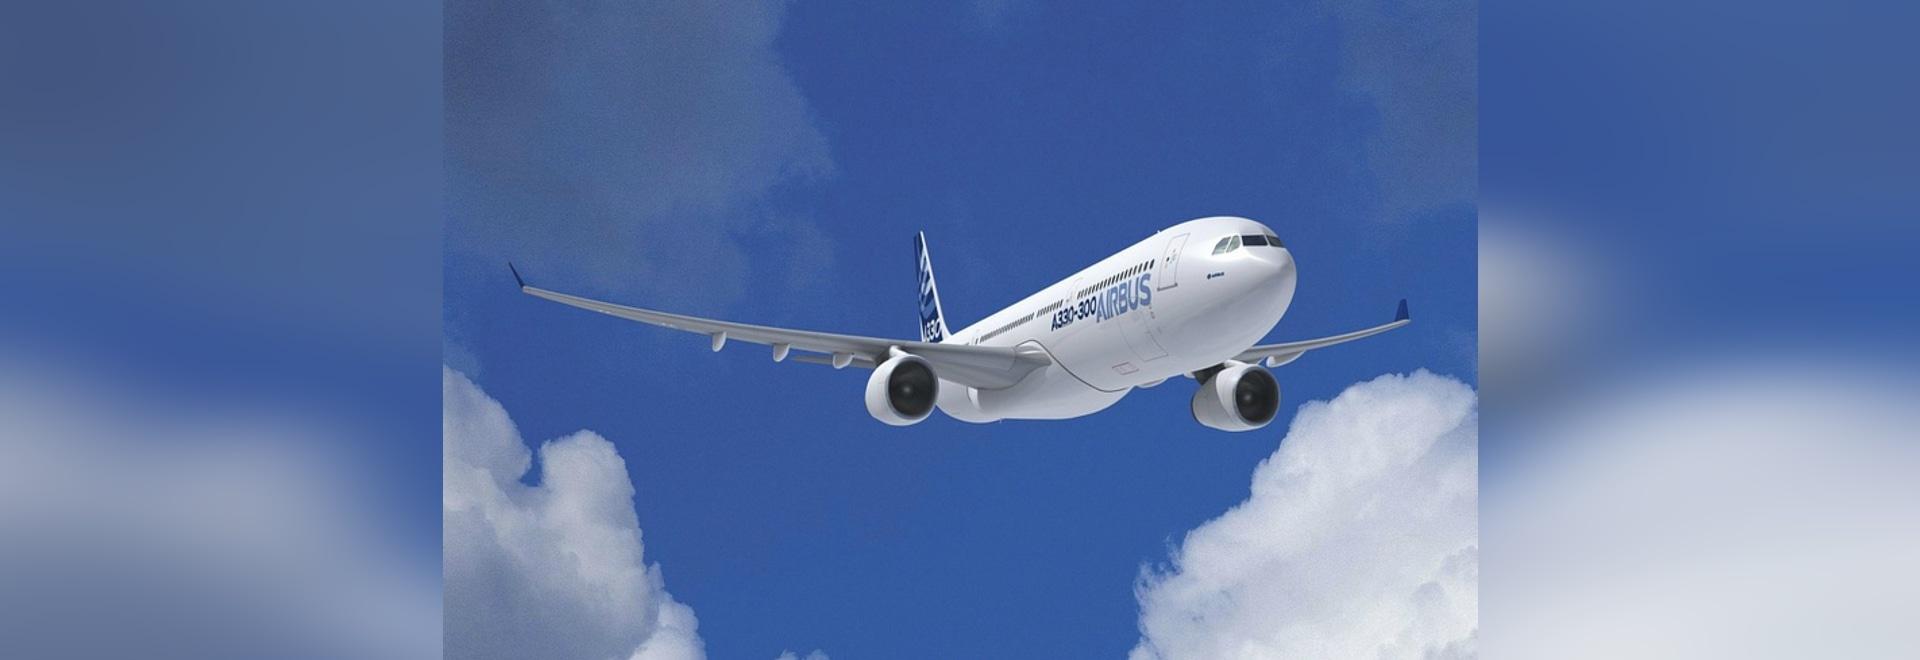 Courtesy of Airbus